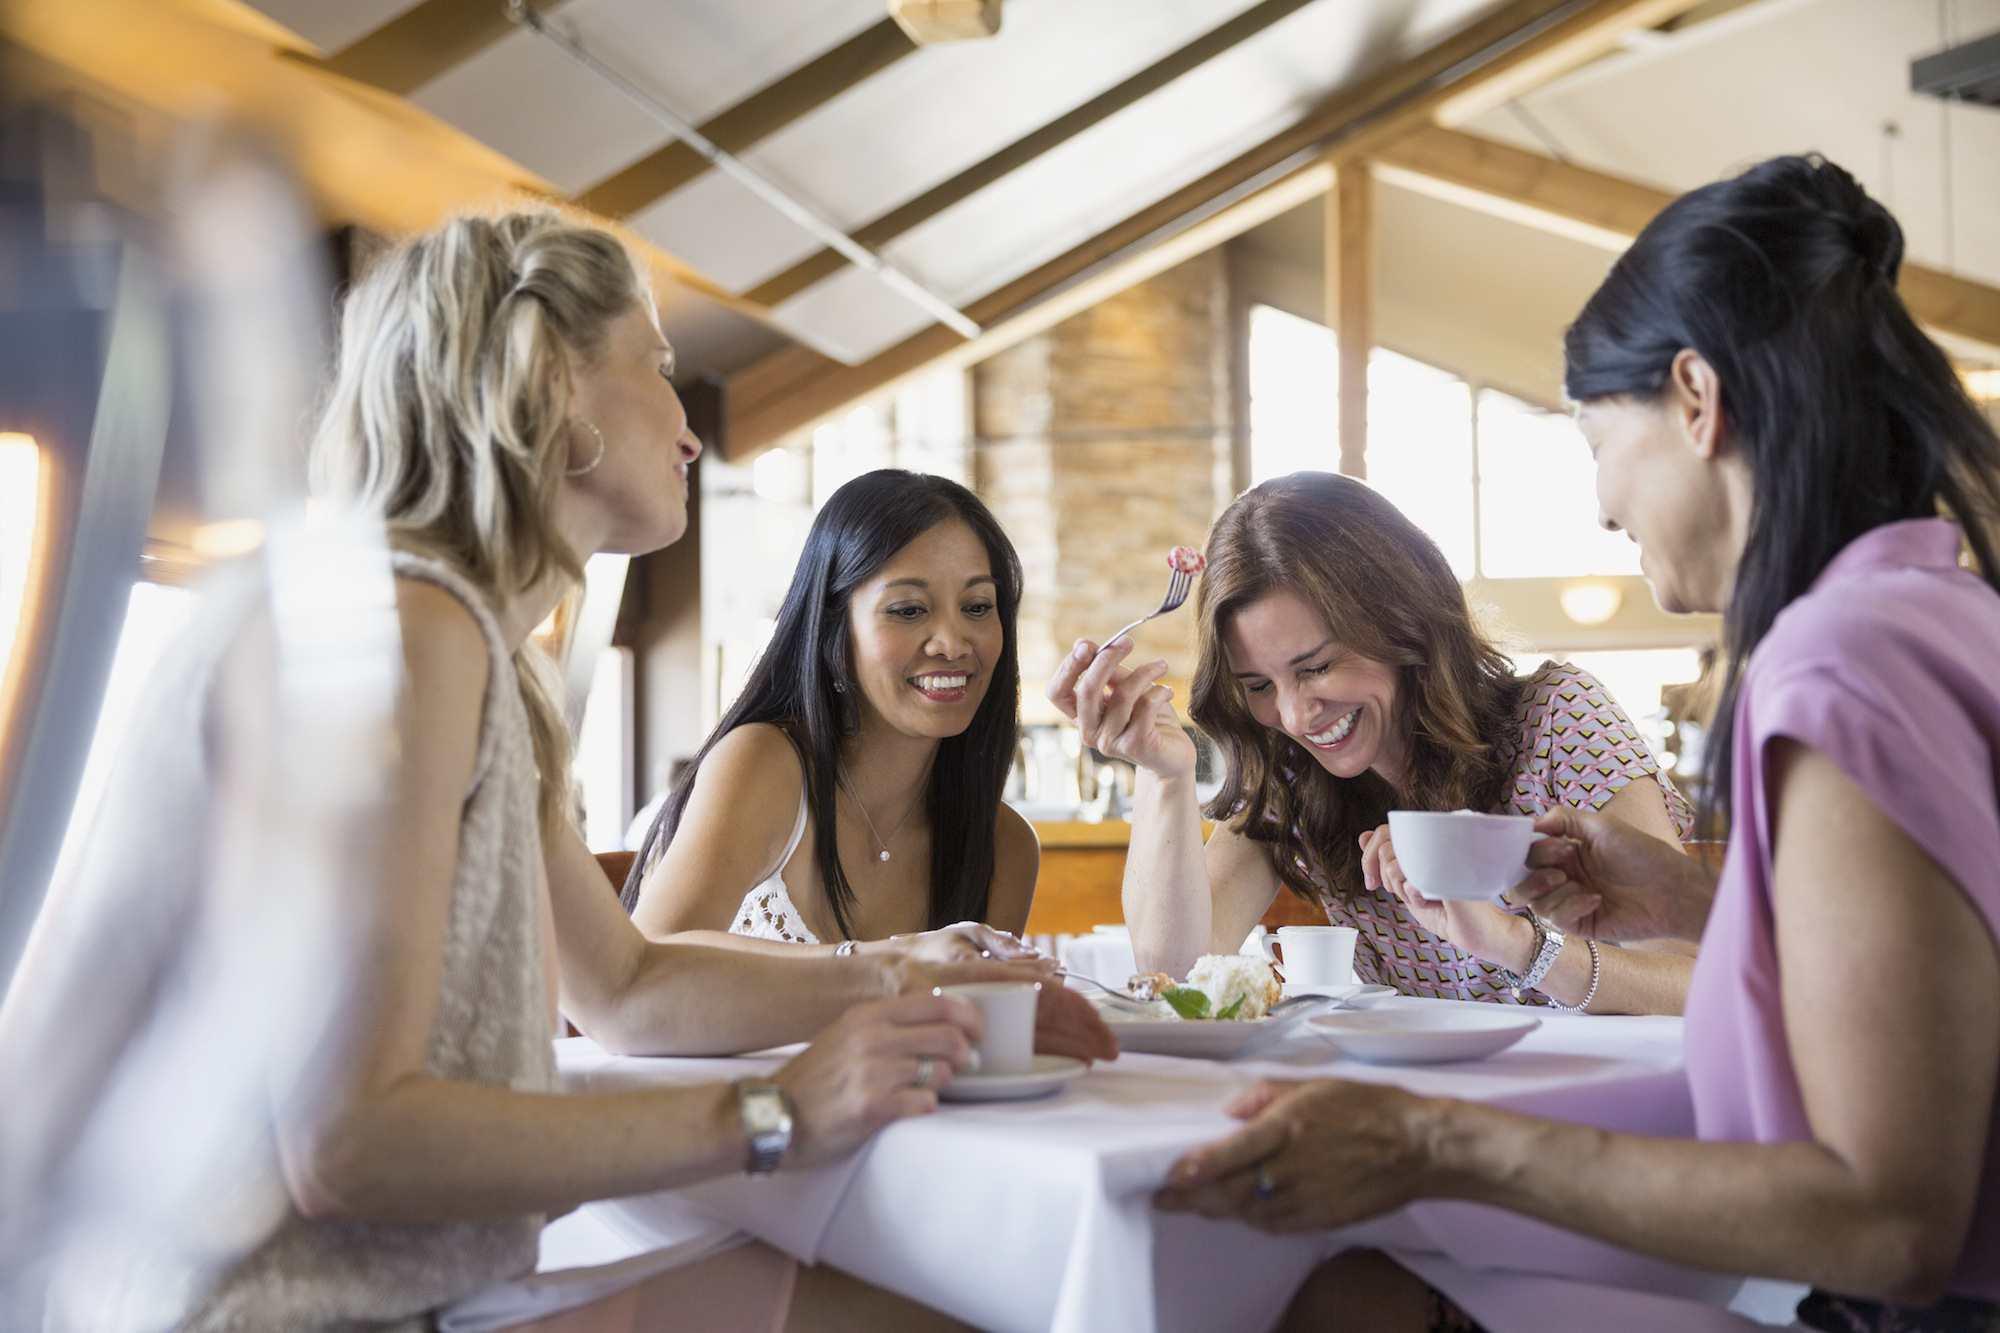 Women eating together in restaurant